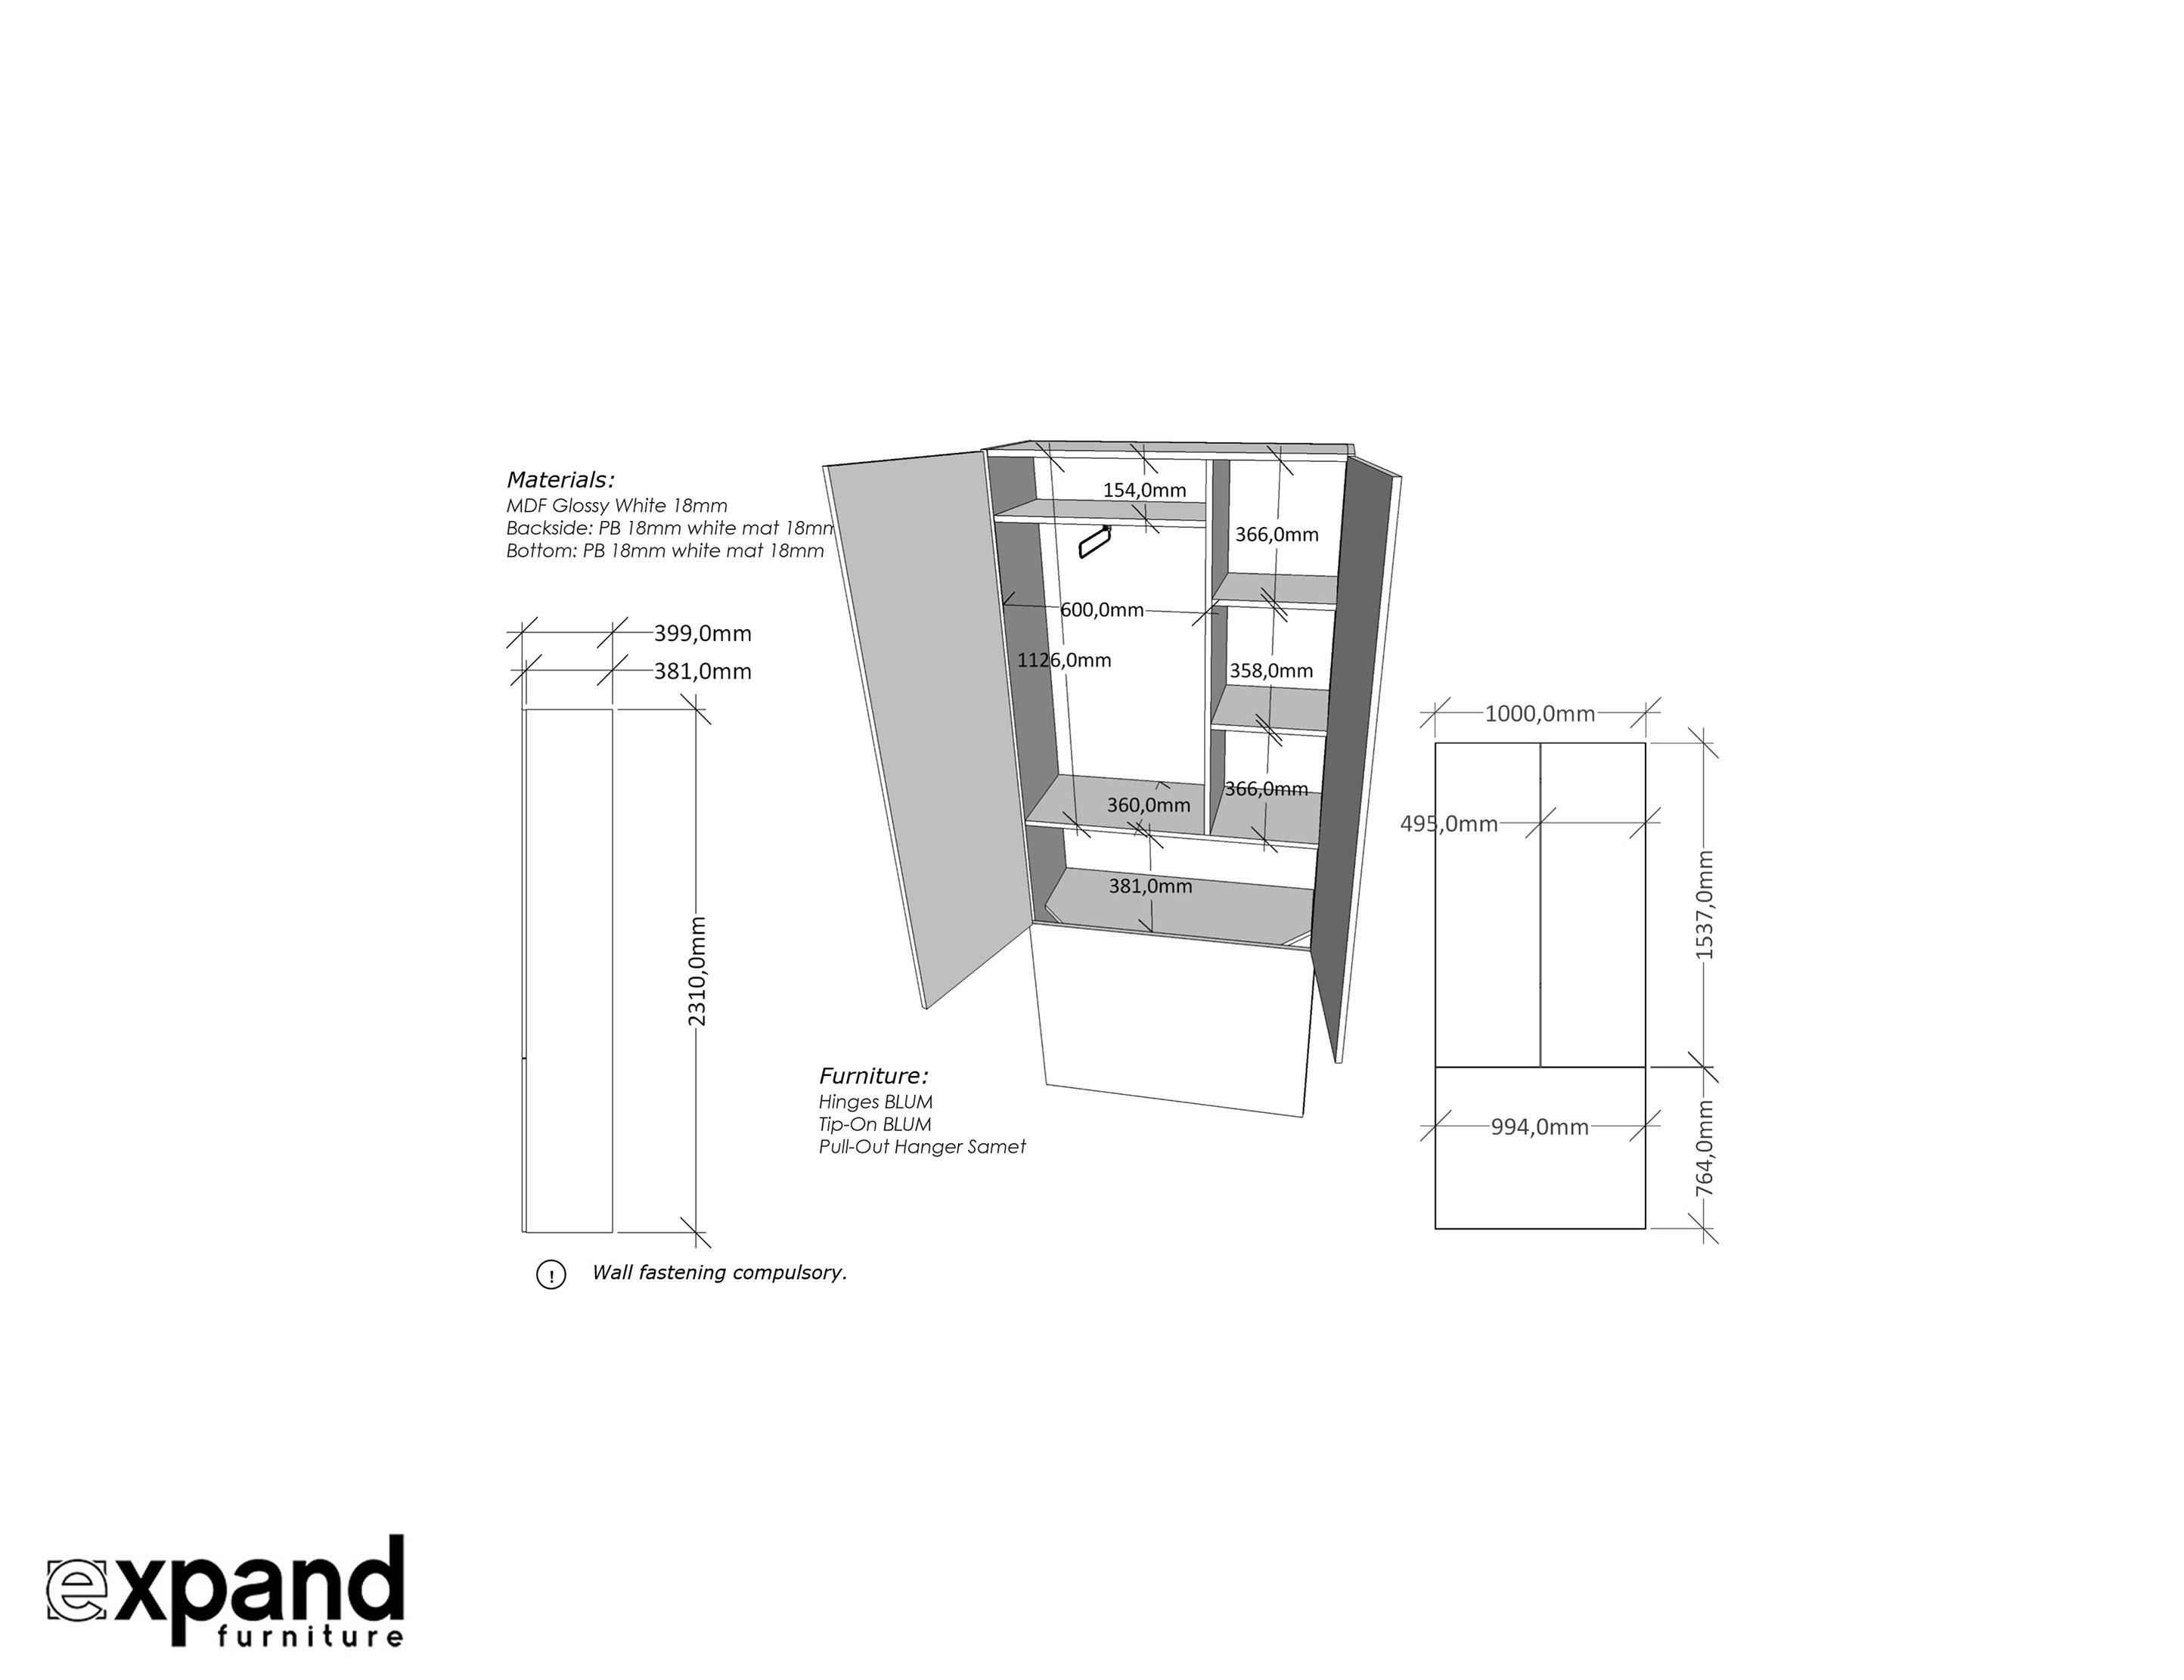 100 cm wide sofa bed mart tyler tx murphysofa  100cm shallow depth cupboard expand